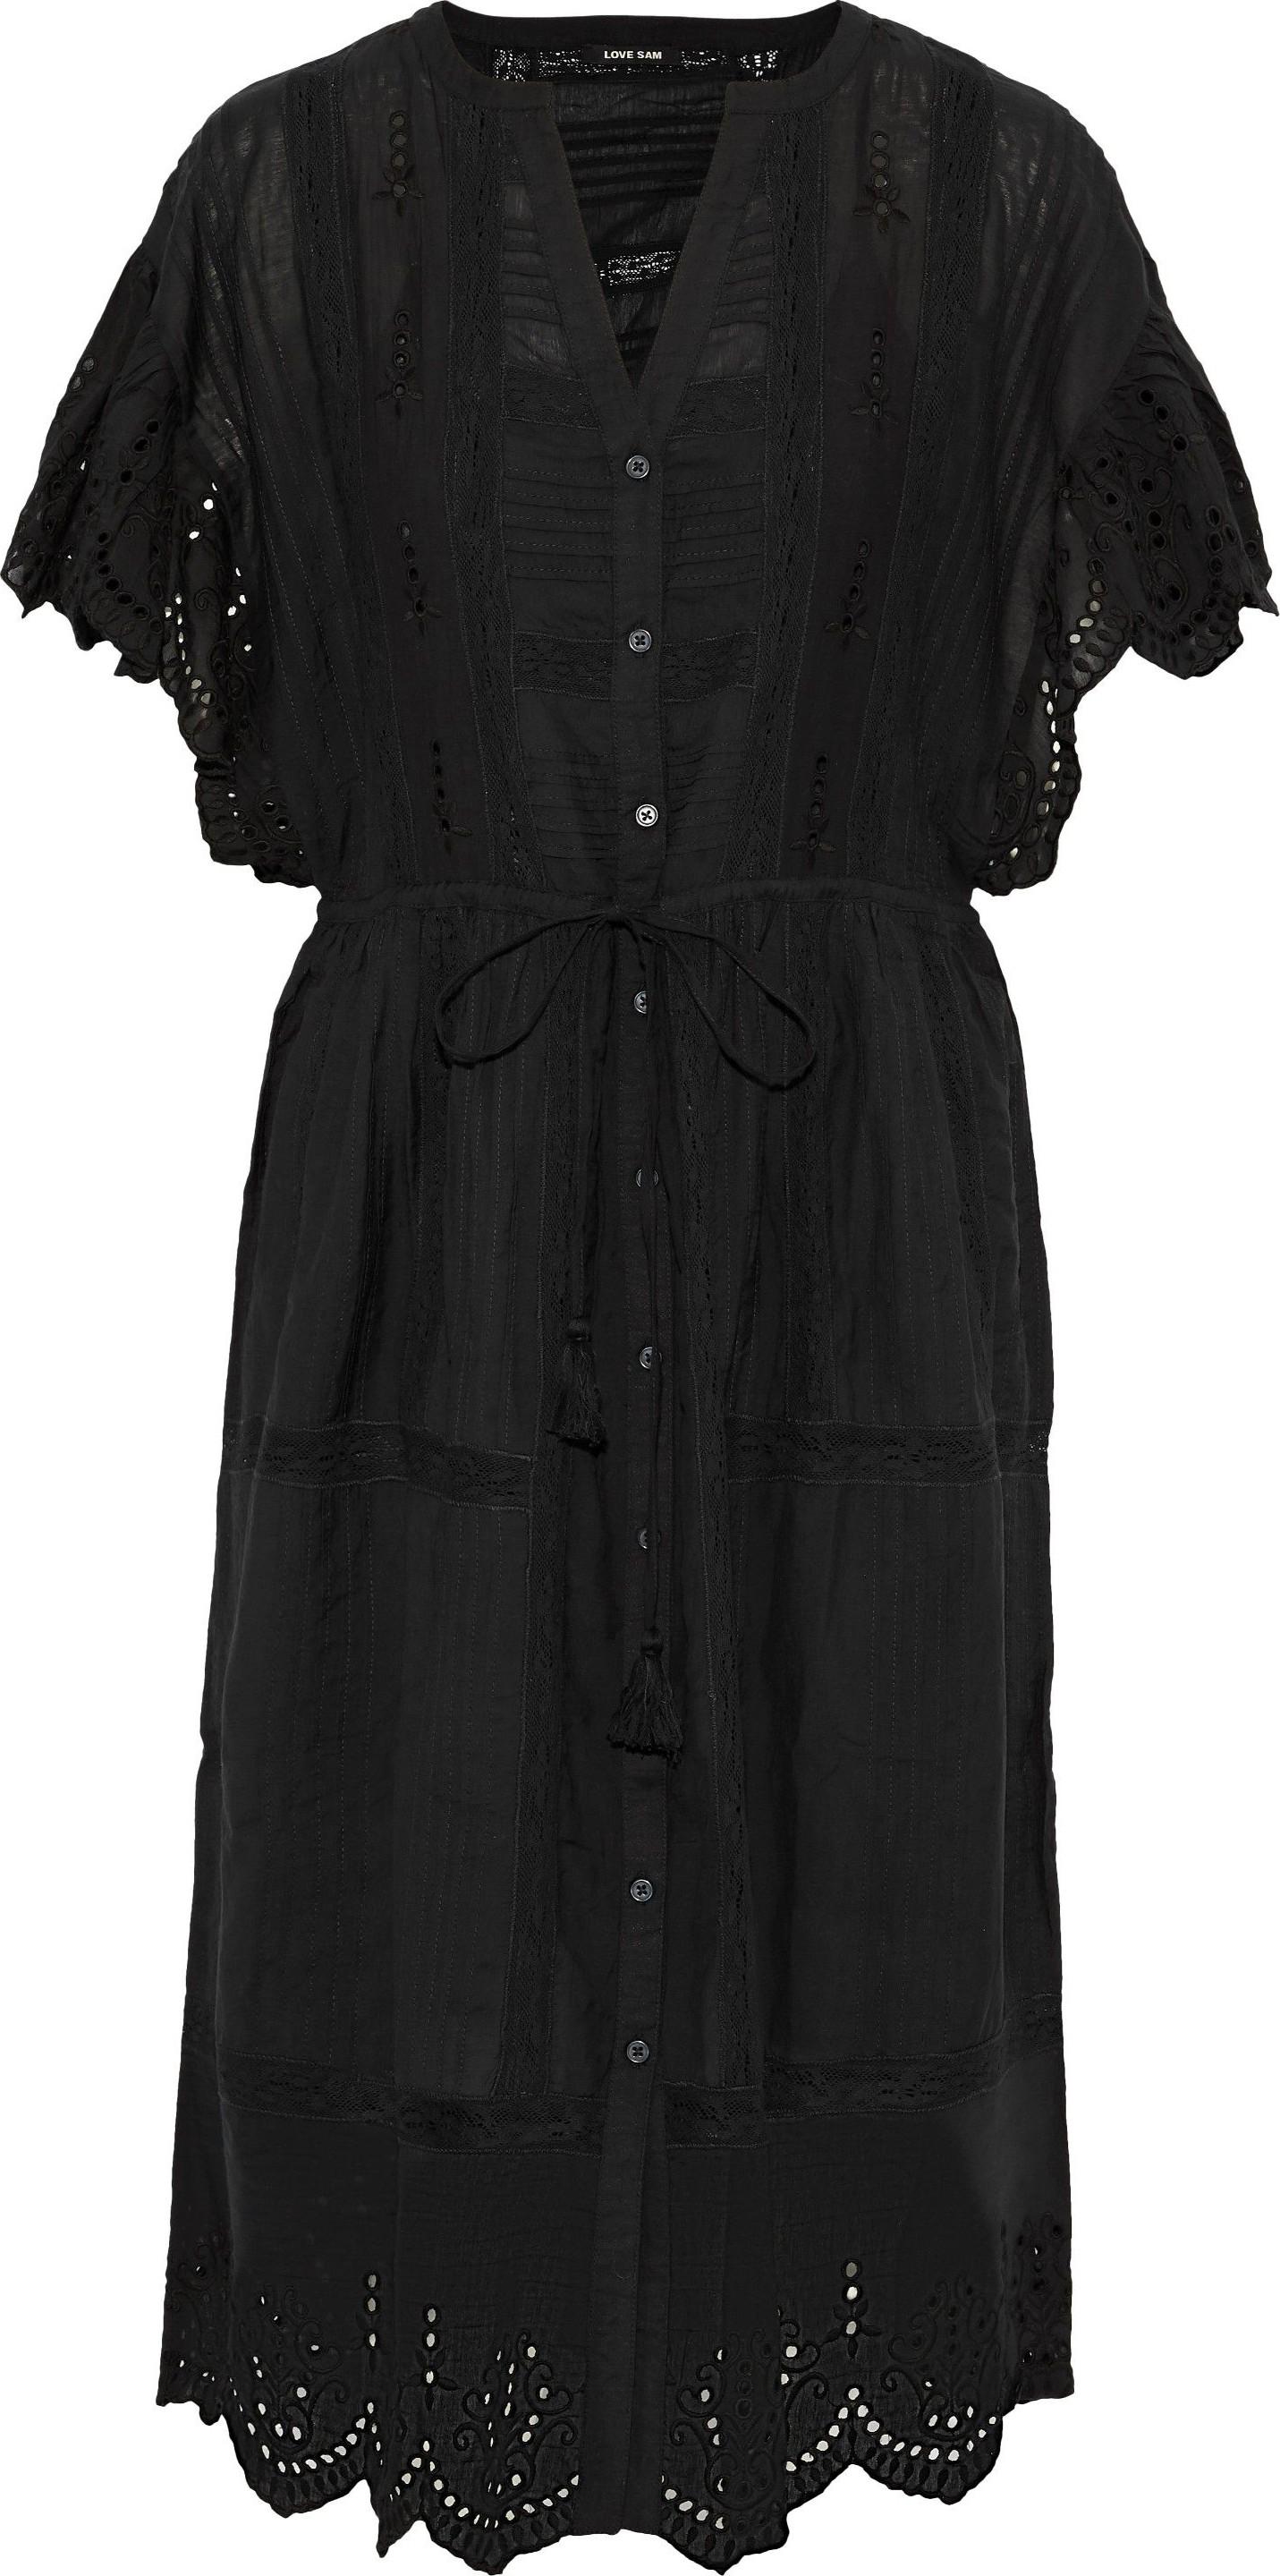 9e84b3cd5f Love Sam Pleated broderie anglaise dress - Mkt